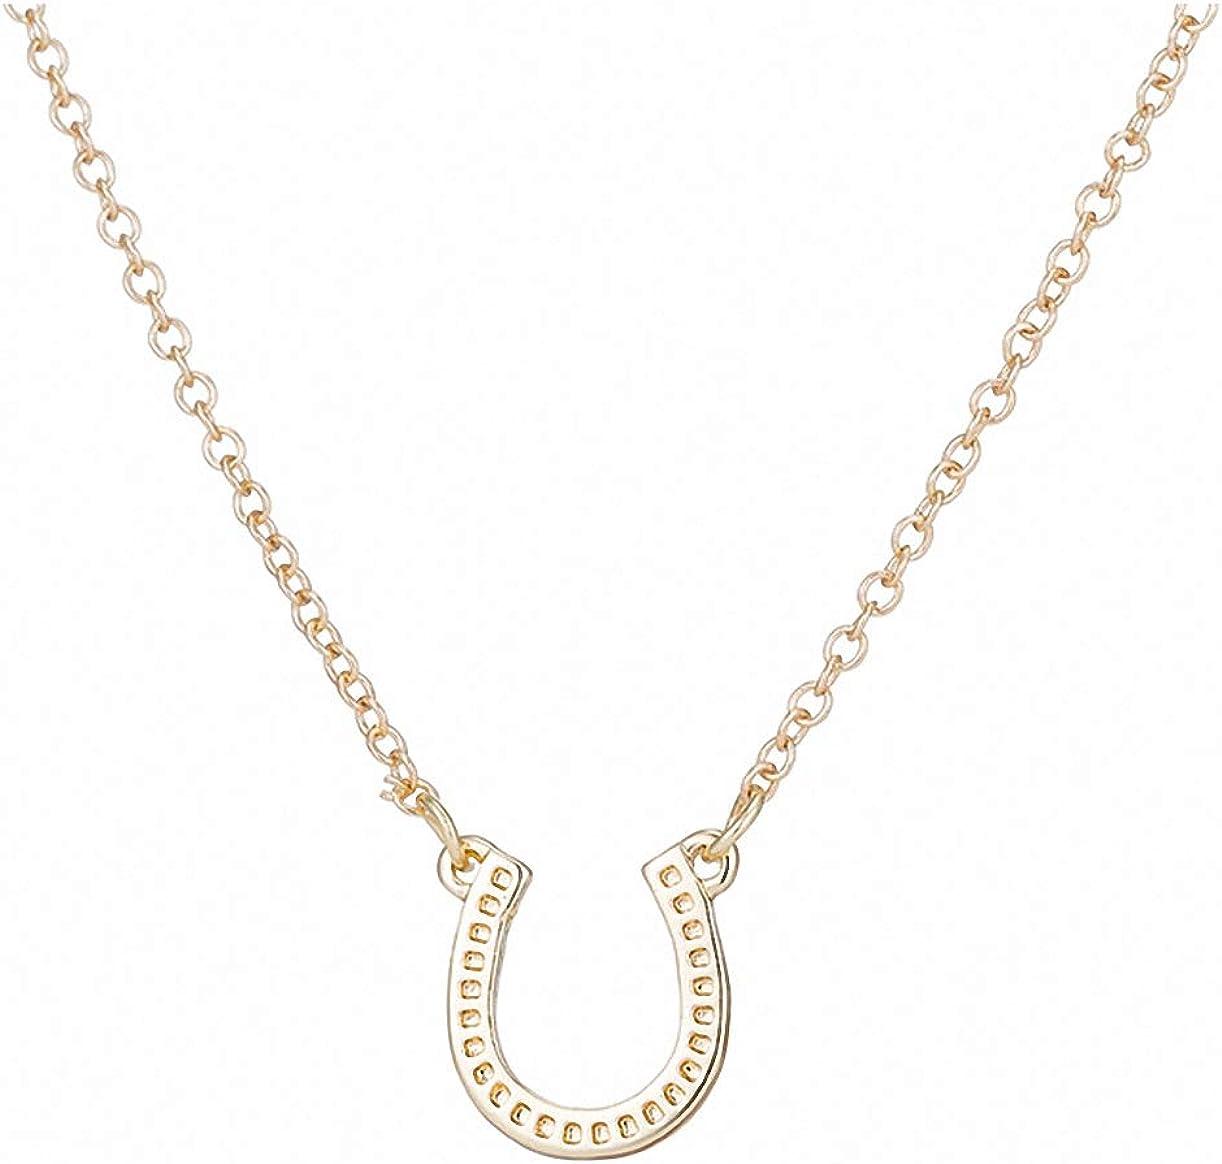 Xileg Lucky Horseshoe Necklace Women Horse Necklace Choker Animal Necklaces & Pendants Paw Necklace Collar